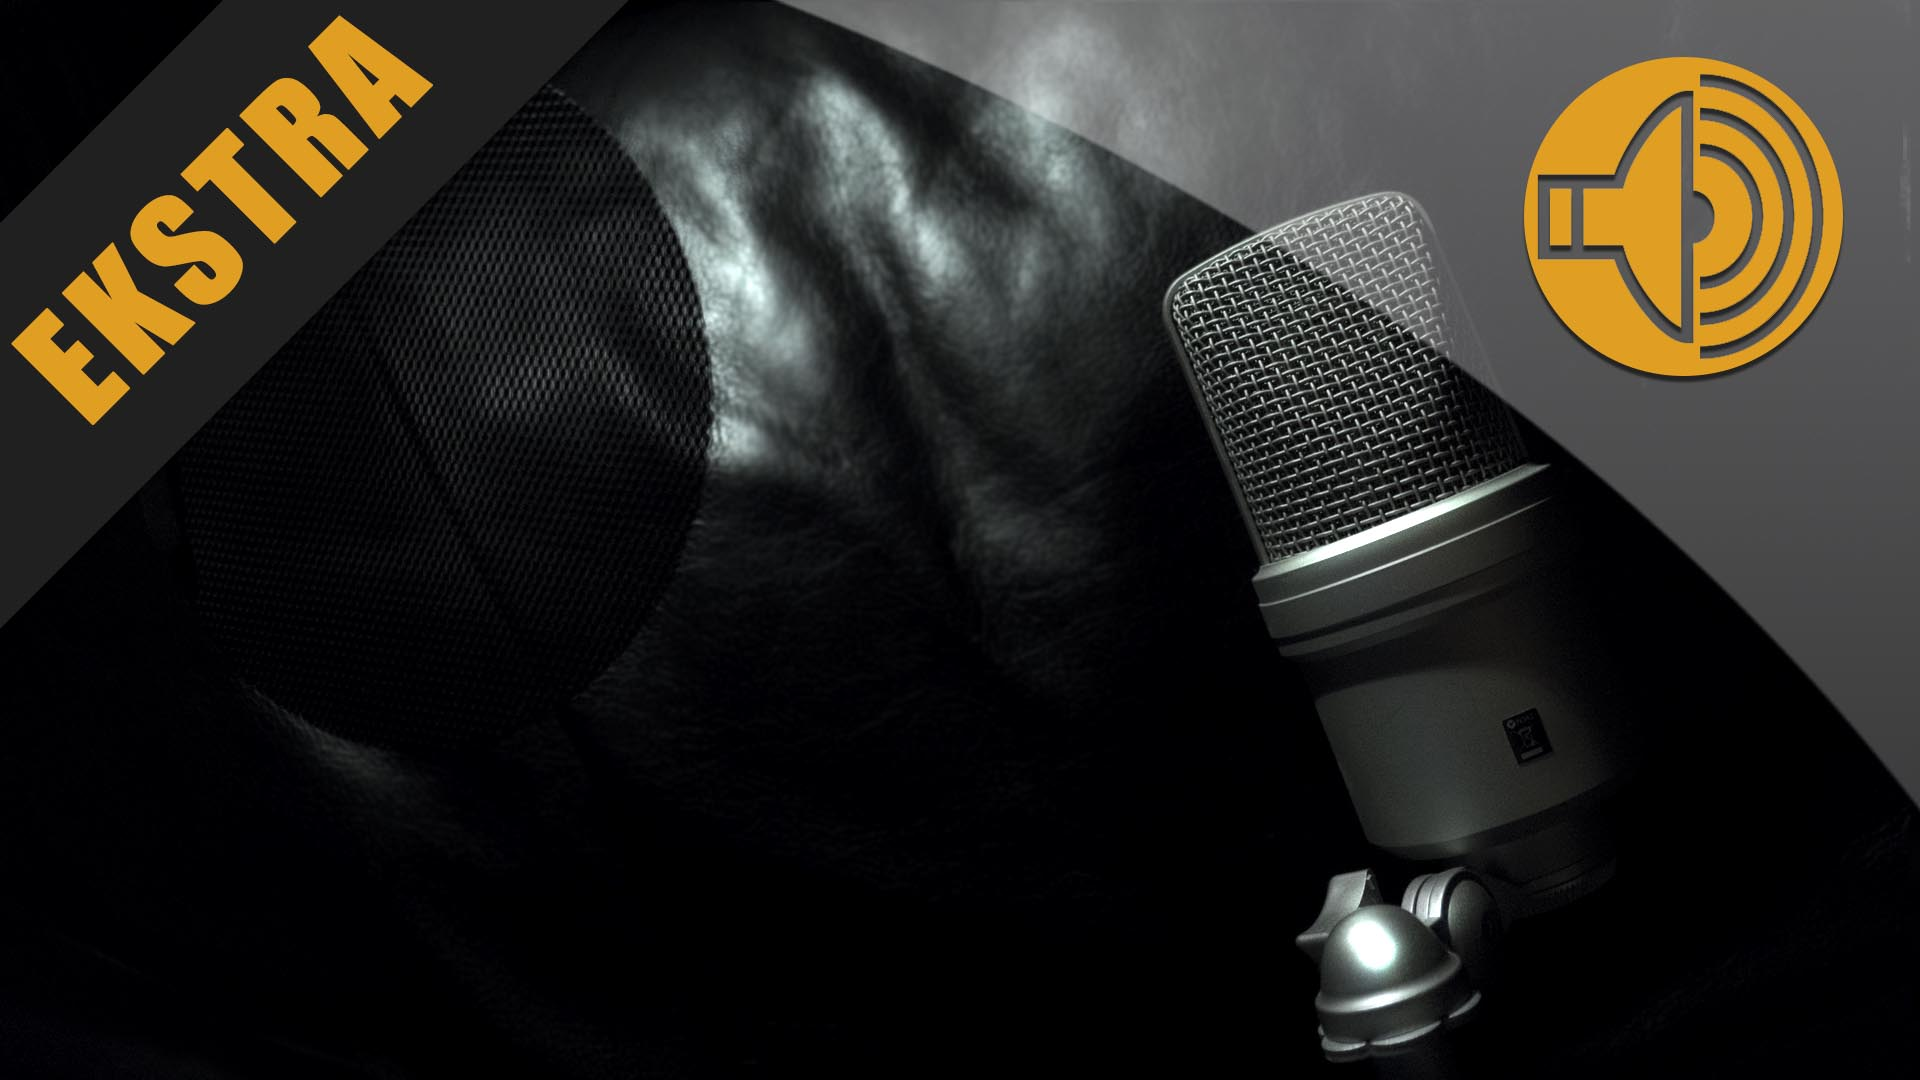 Svart snø: Radioprogrammene